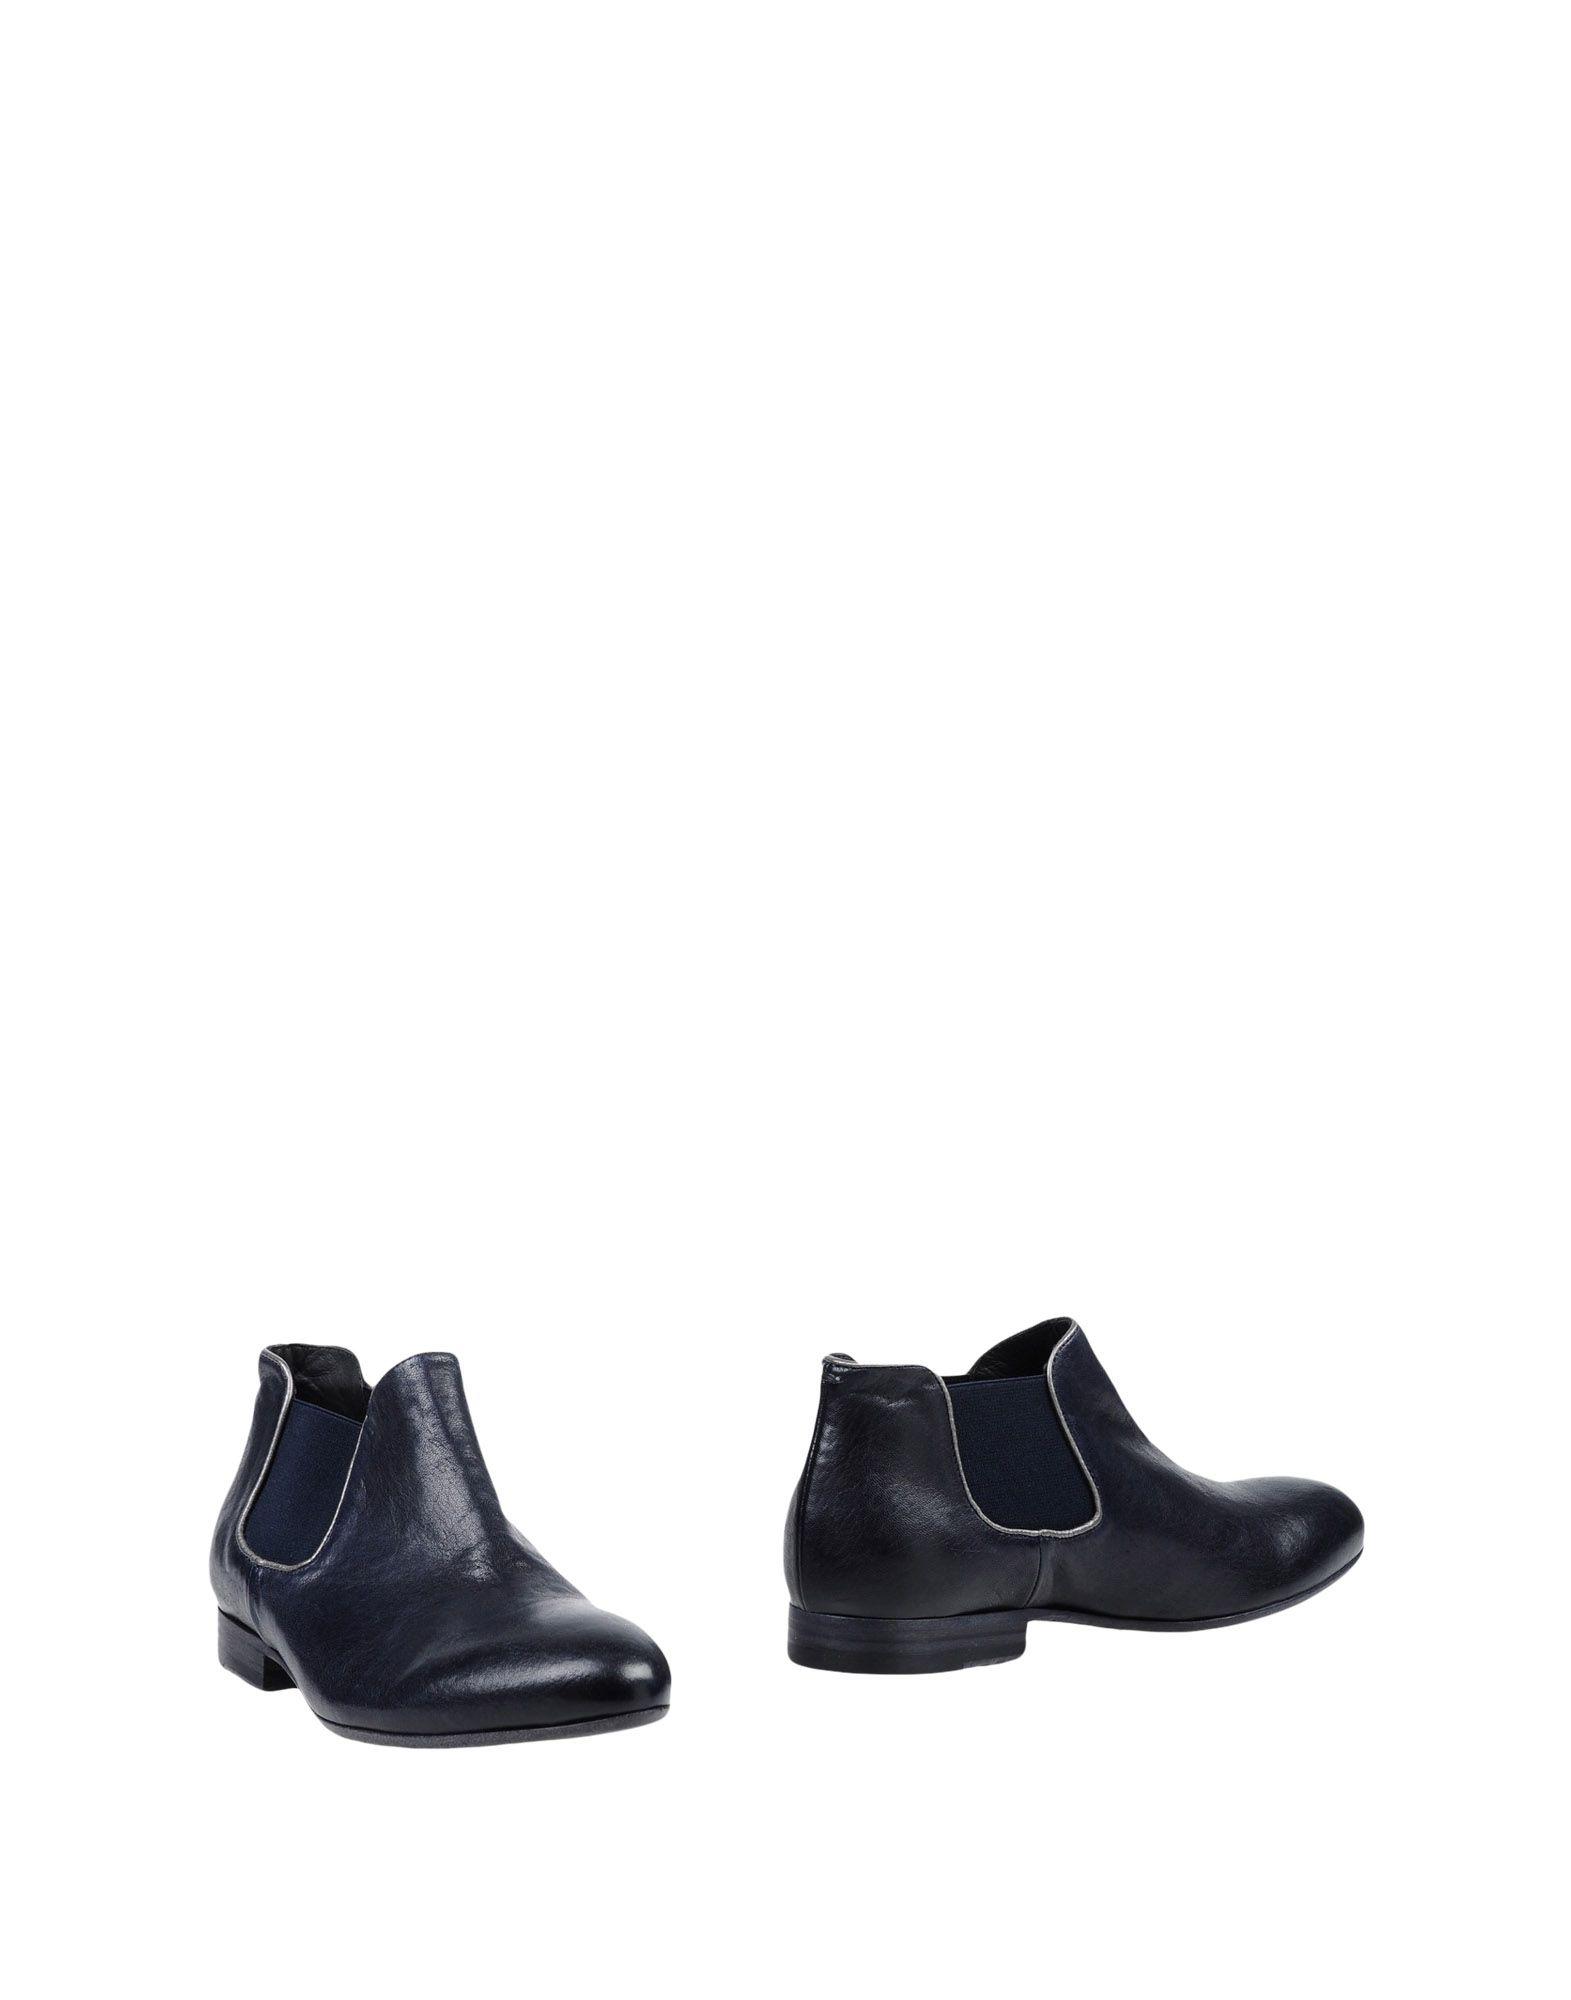 ФОТО pantanetti Полусапоги и высокие ботинки